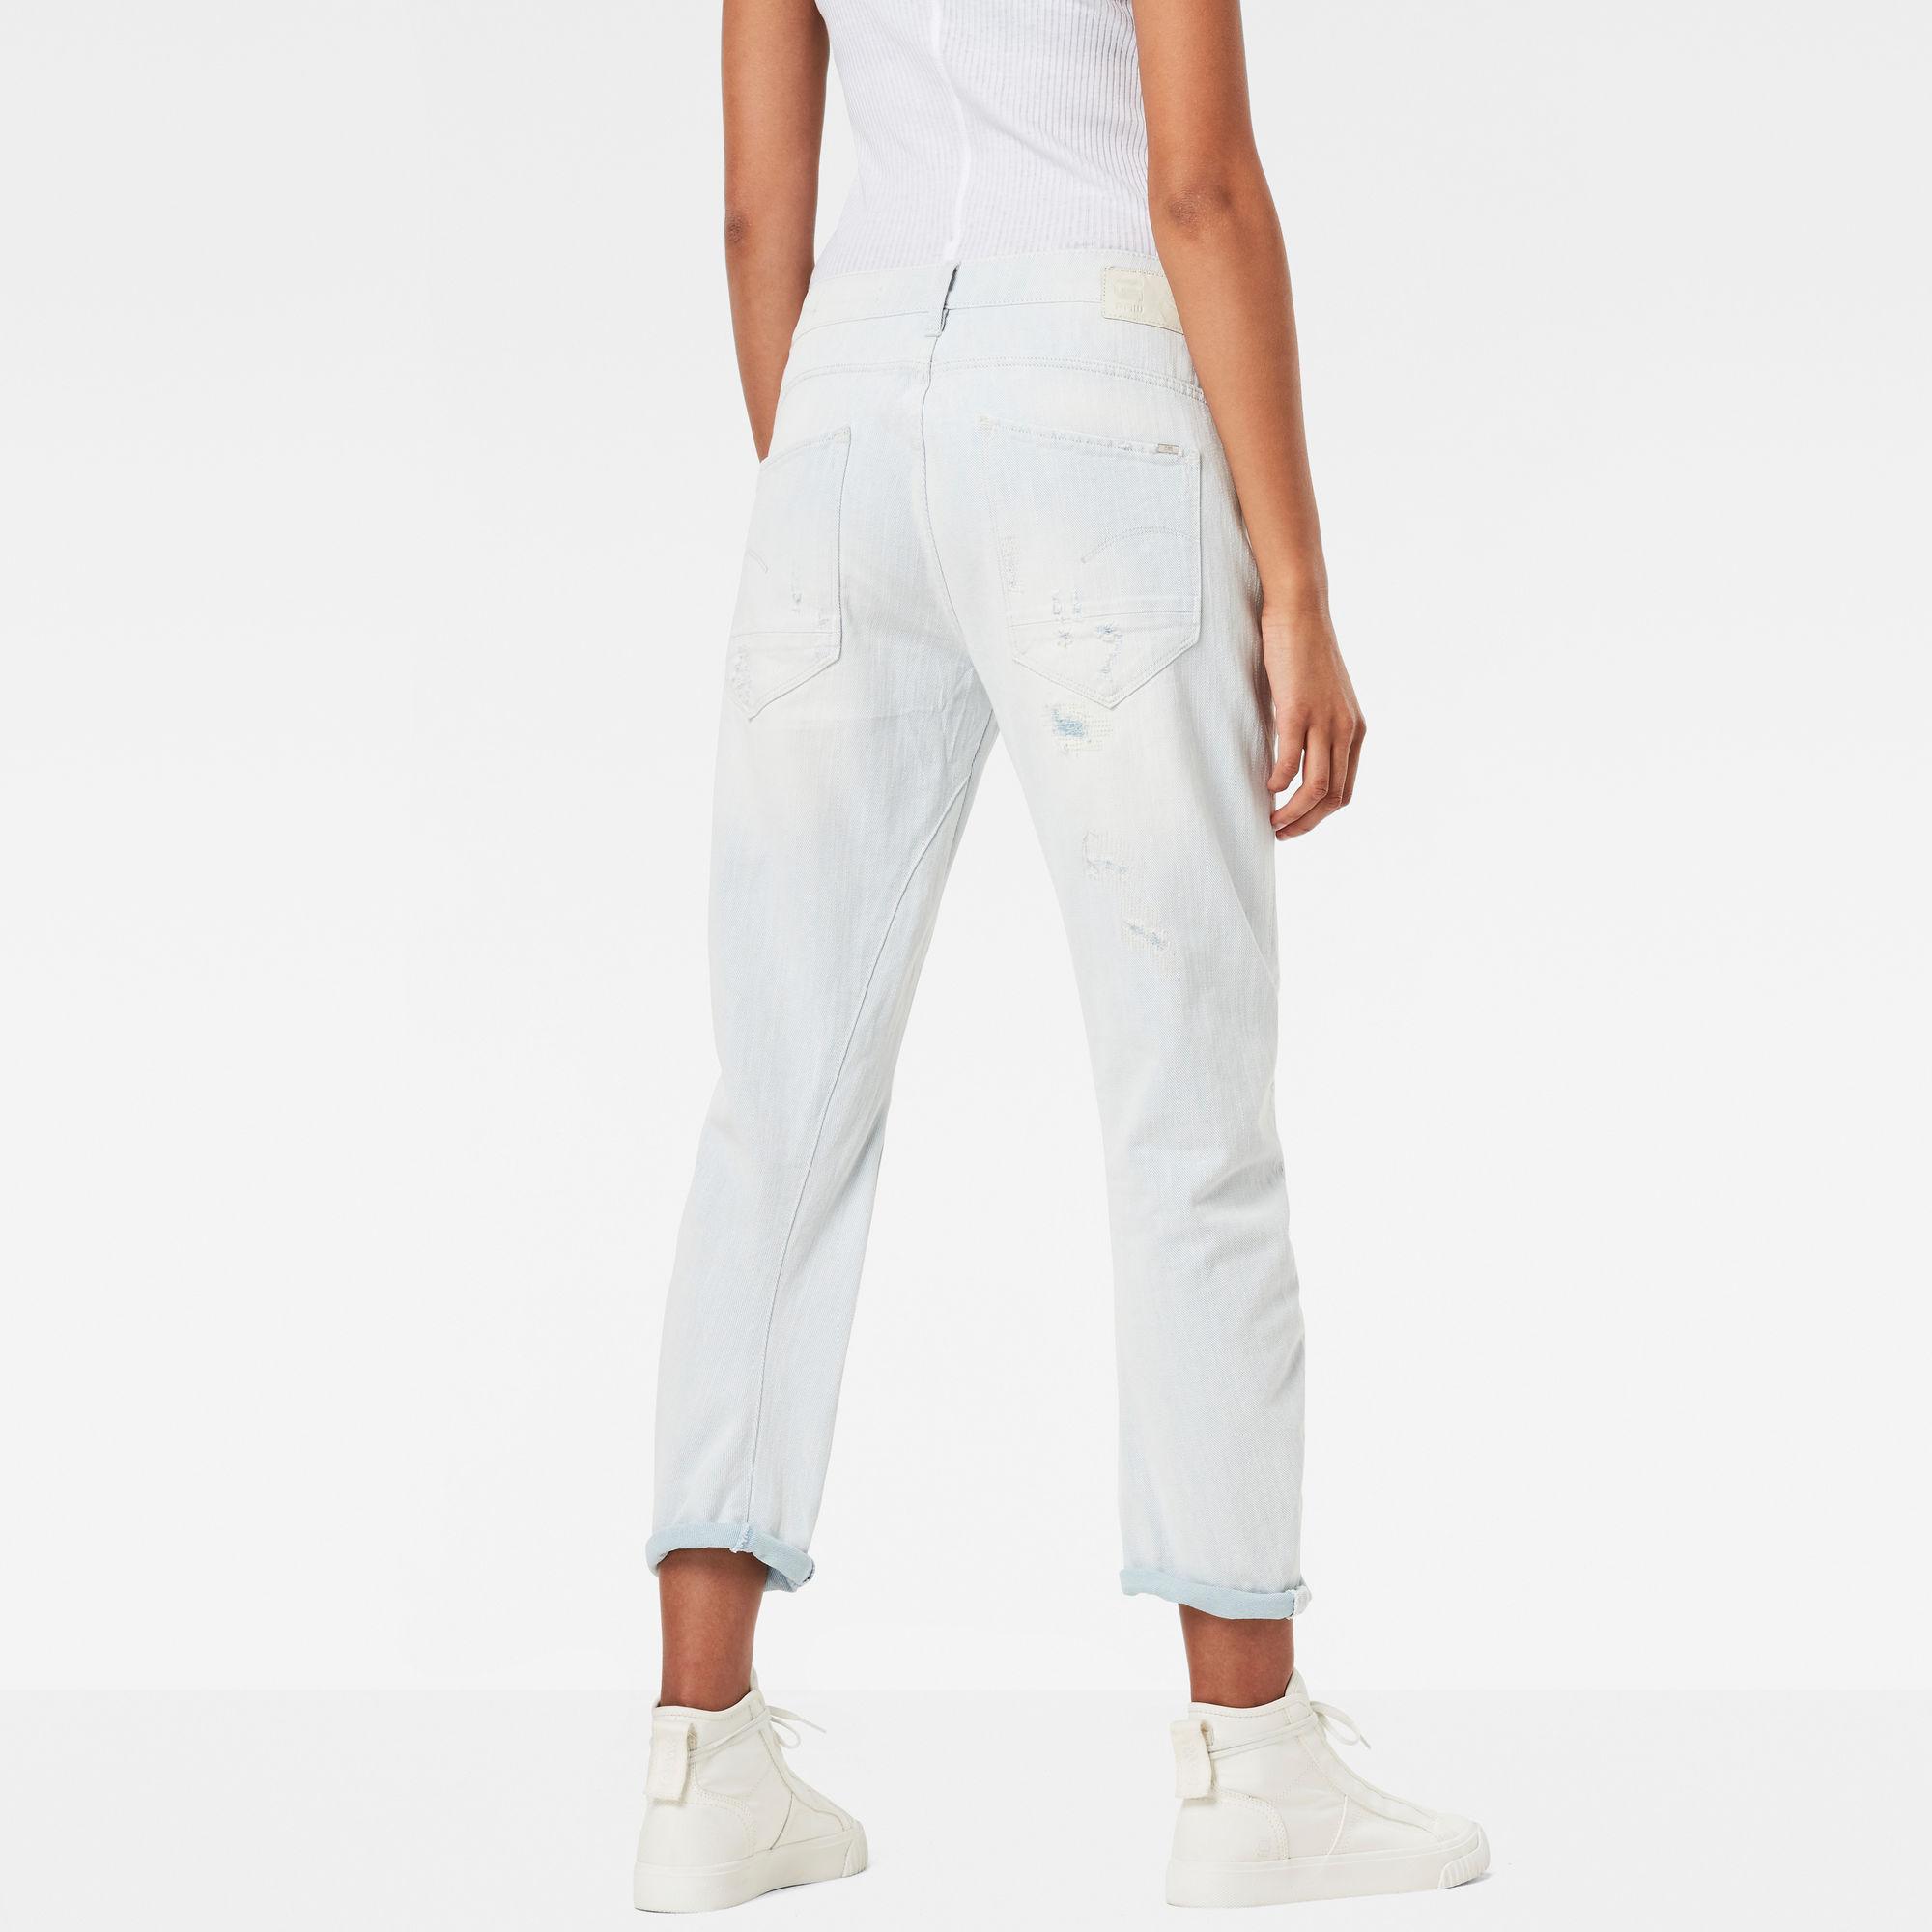 Arc 3D Mid Waist Boyfriend 7/8 Jeans